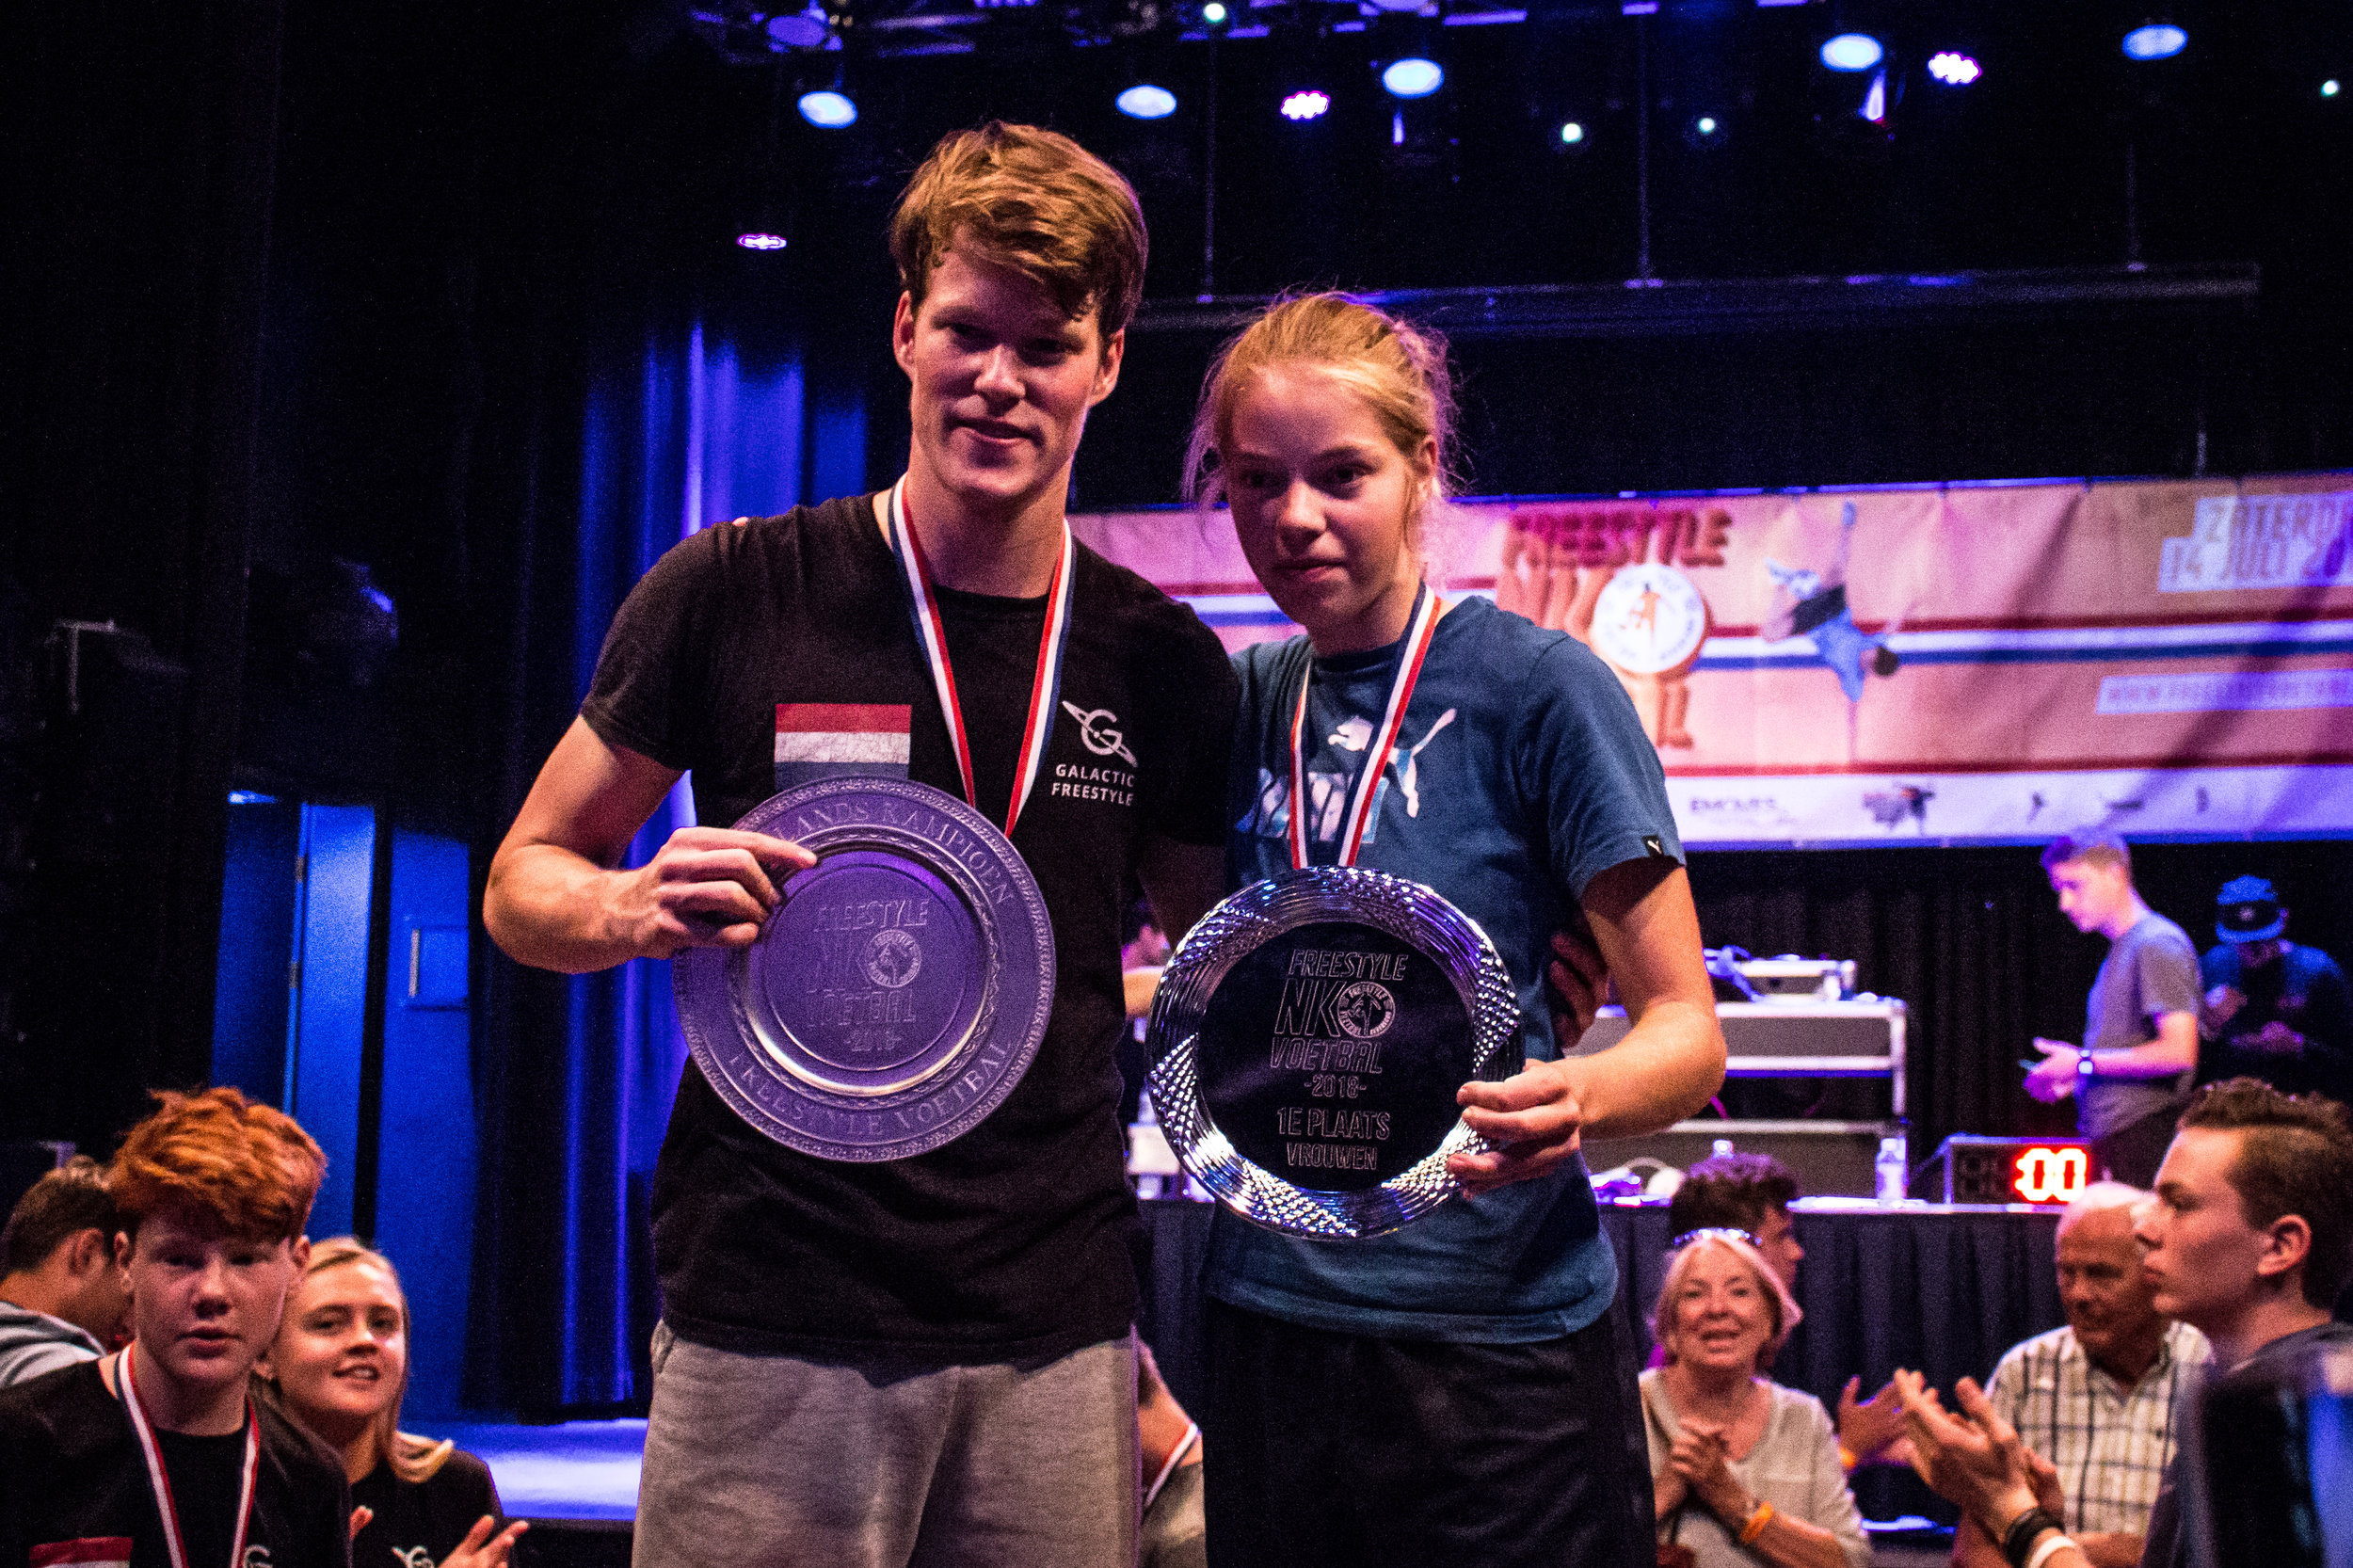 NK Freestyle Voetbal 2018 - Nederlands kampioenen Jesse Marlet & Laura Dekker